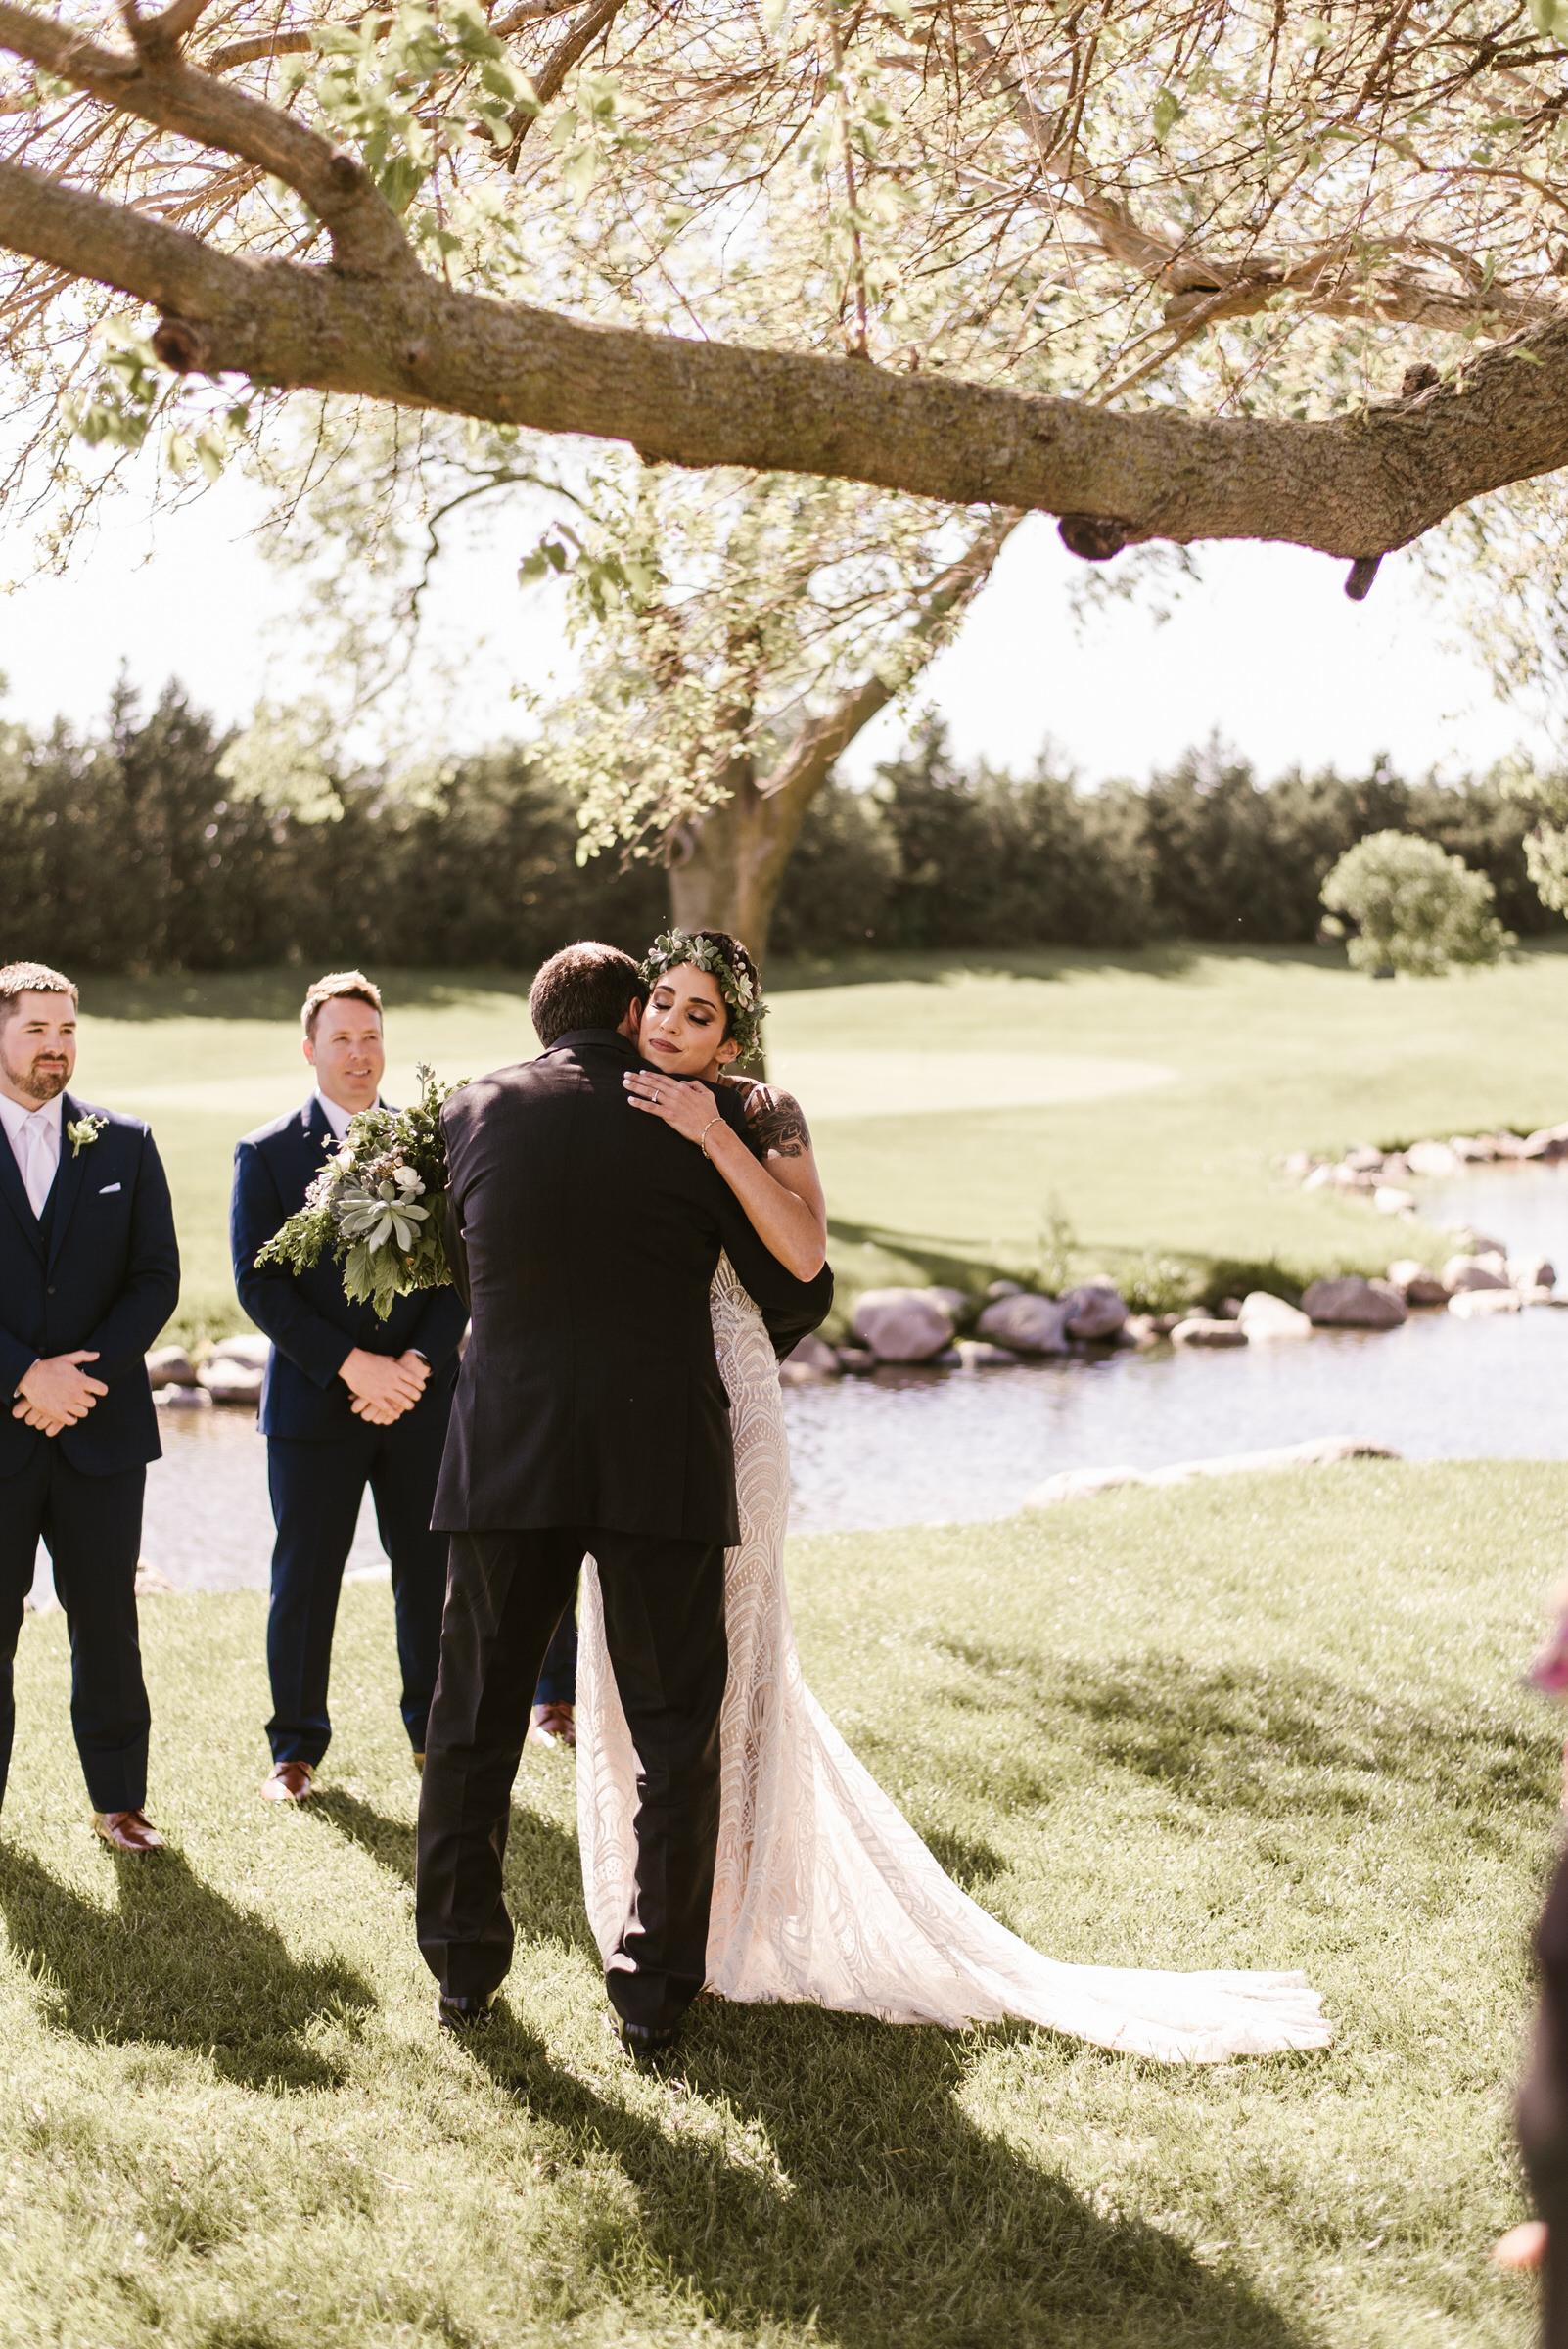 Wilderness-Ridge-Lincoln-Nebraska-Wedding-Kaylie-Sirek-Photography-052.jpg